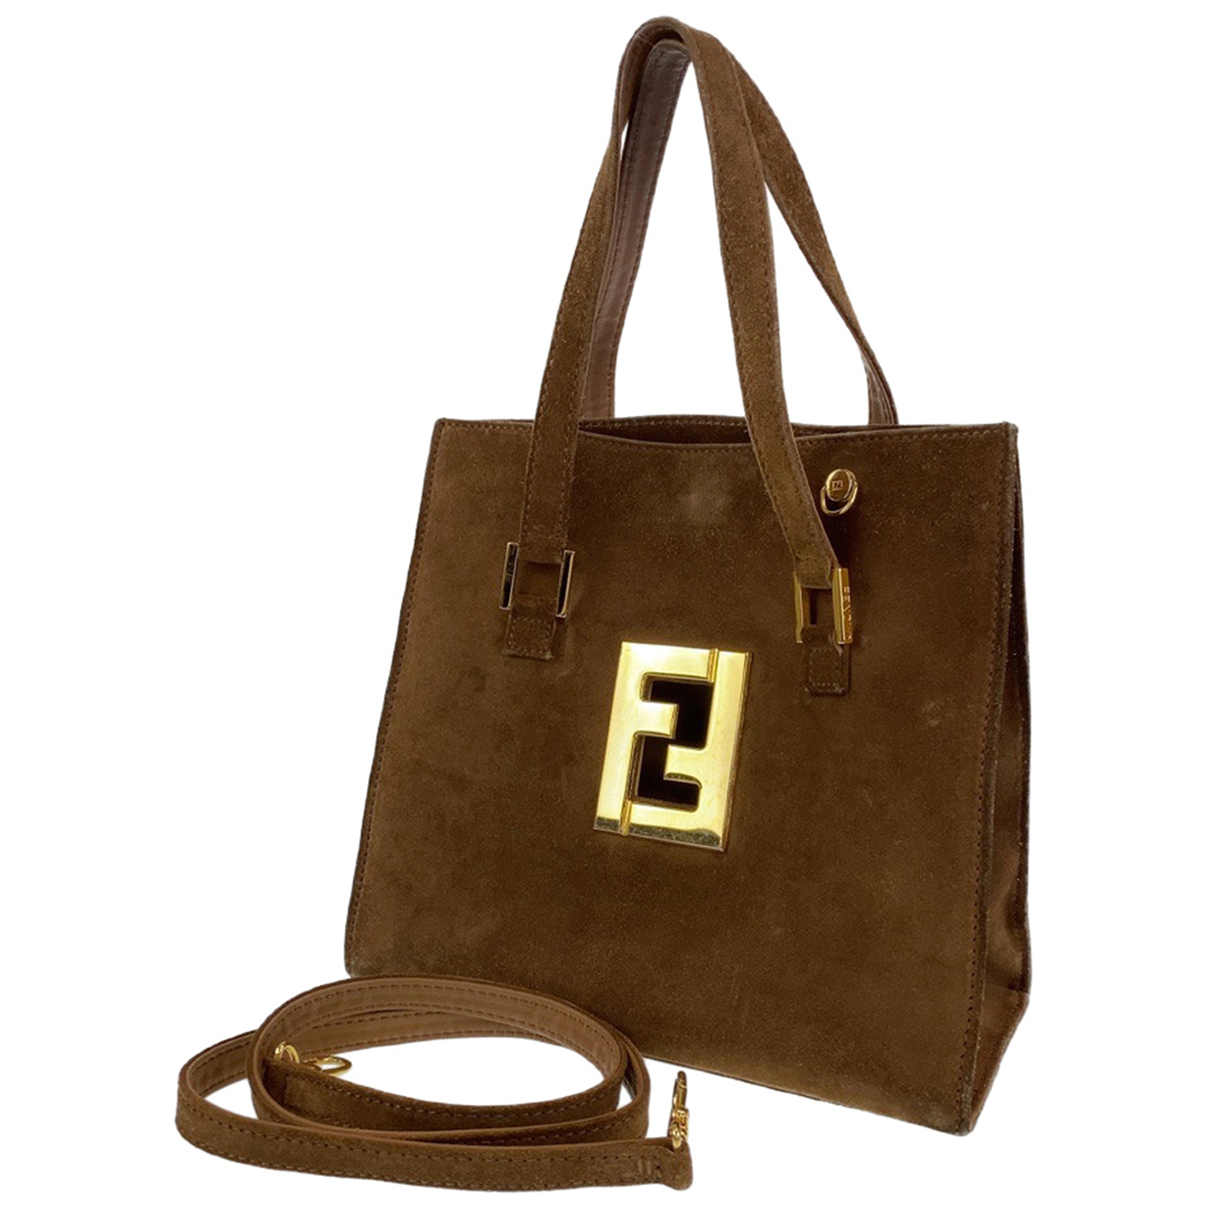 Fendi \N Handtasche in Veloursleder